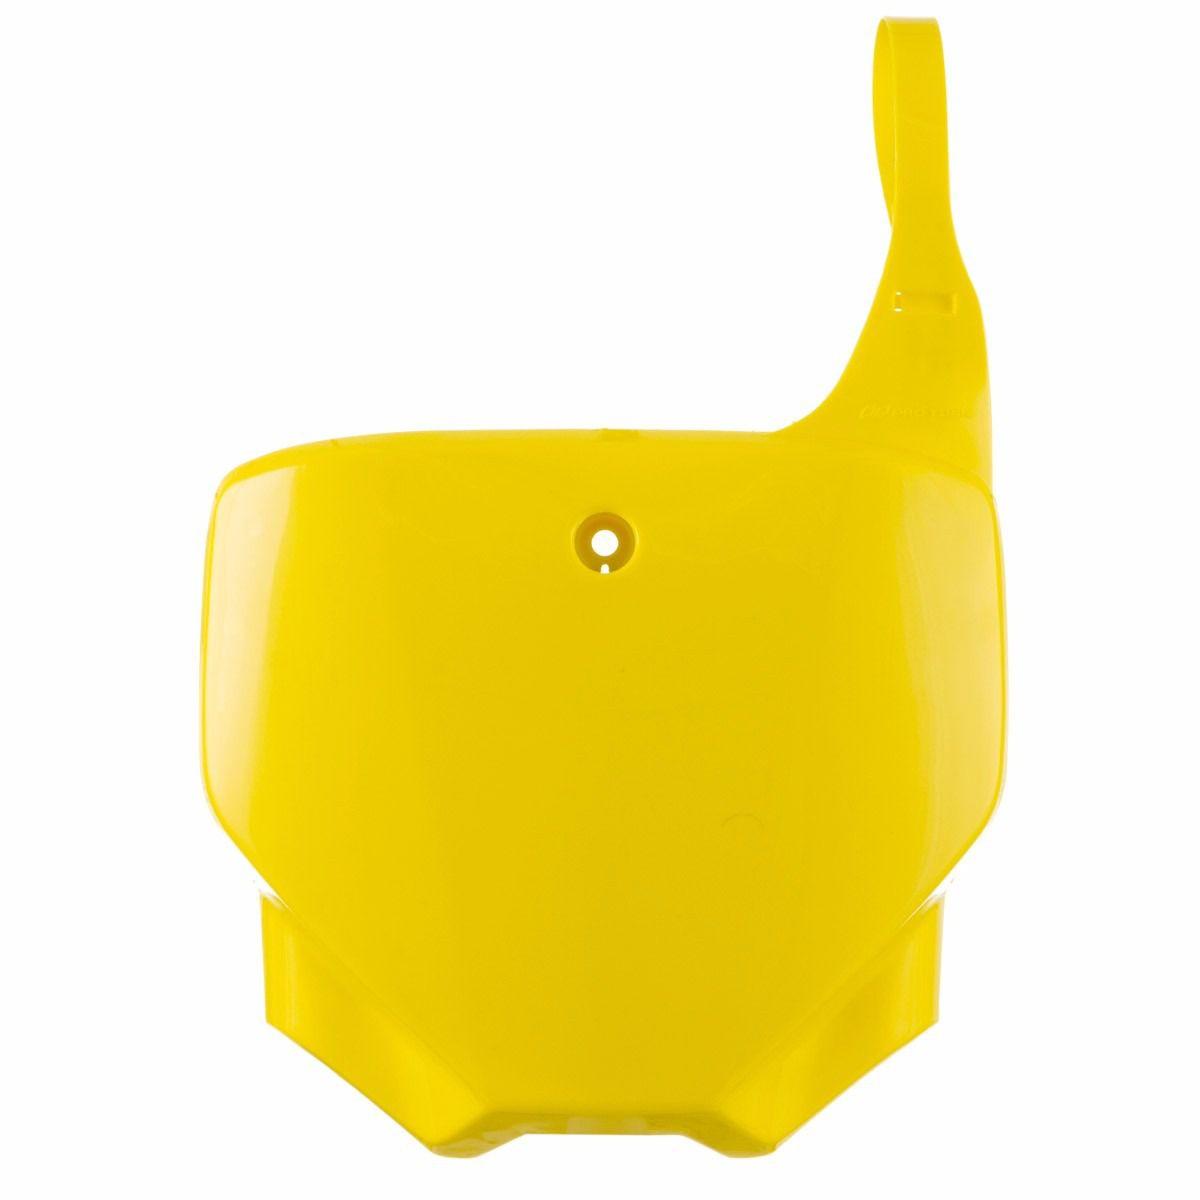 NUMBER PLATE PRO TORK HONDA CRF-230